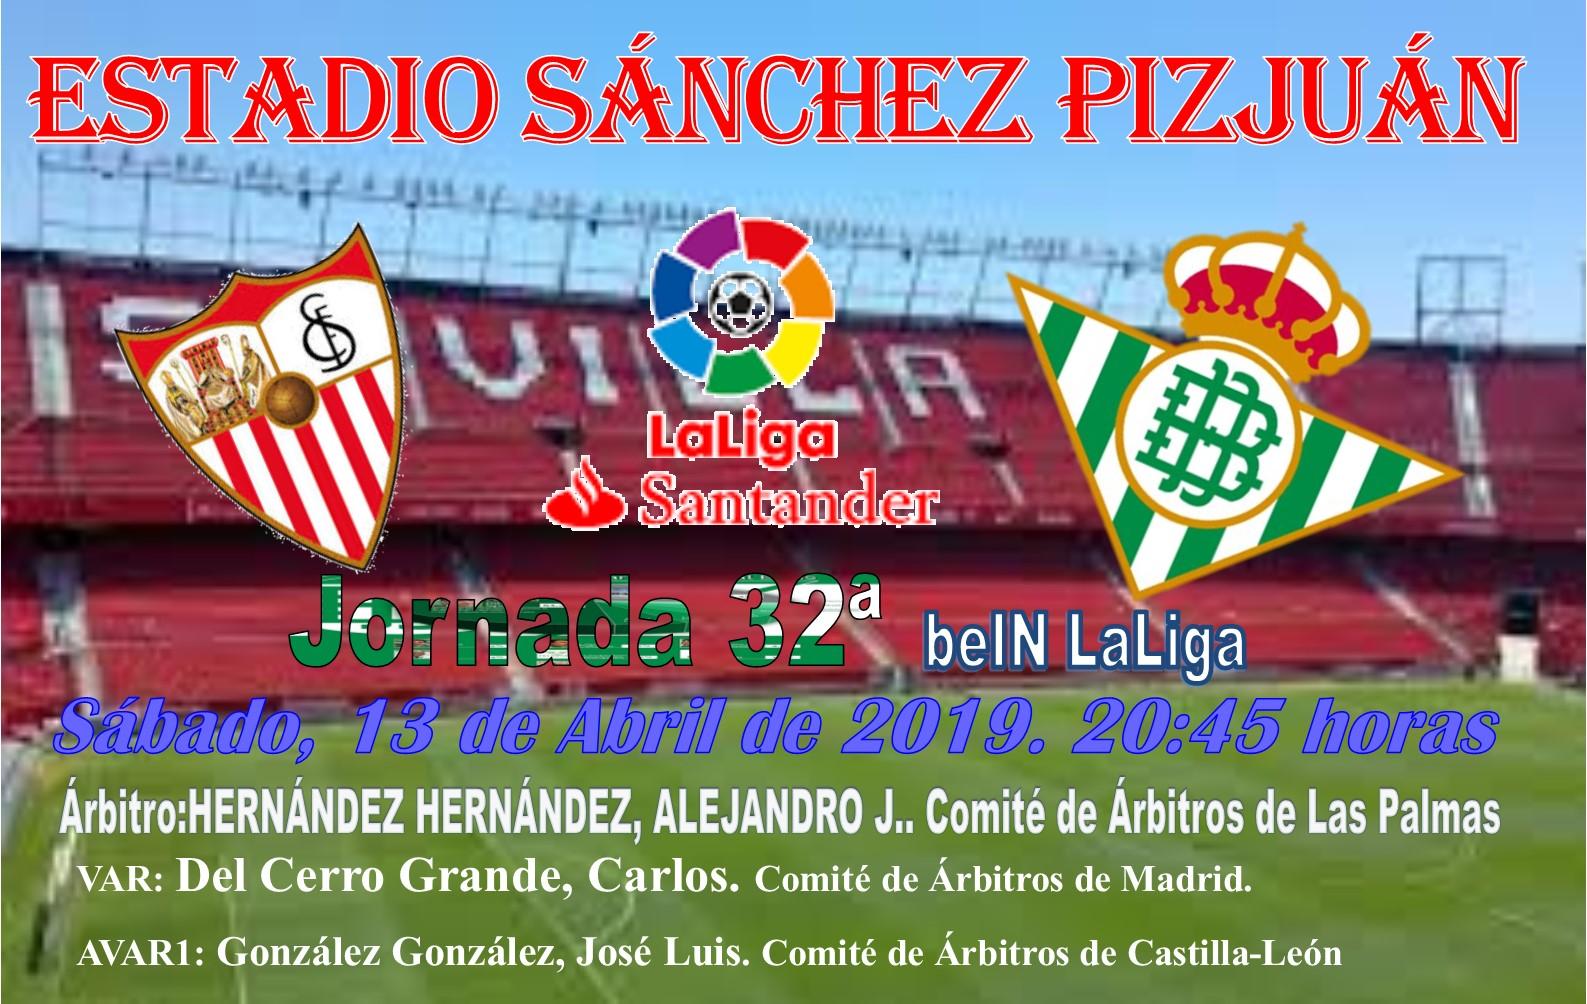 Calendario Liga Santander 2019 20 Betis.F P R B El Gran Derbi